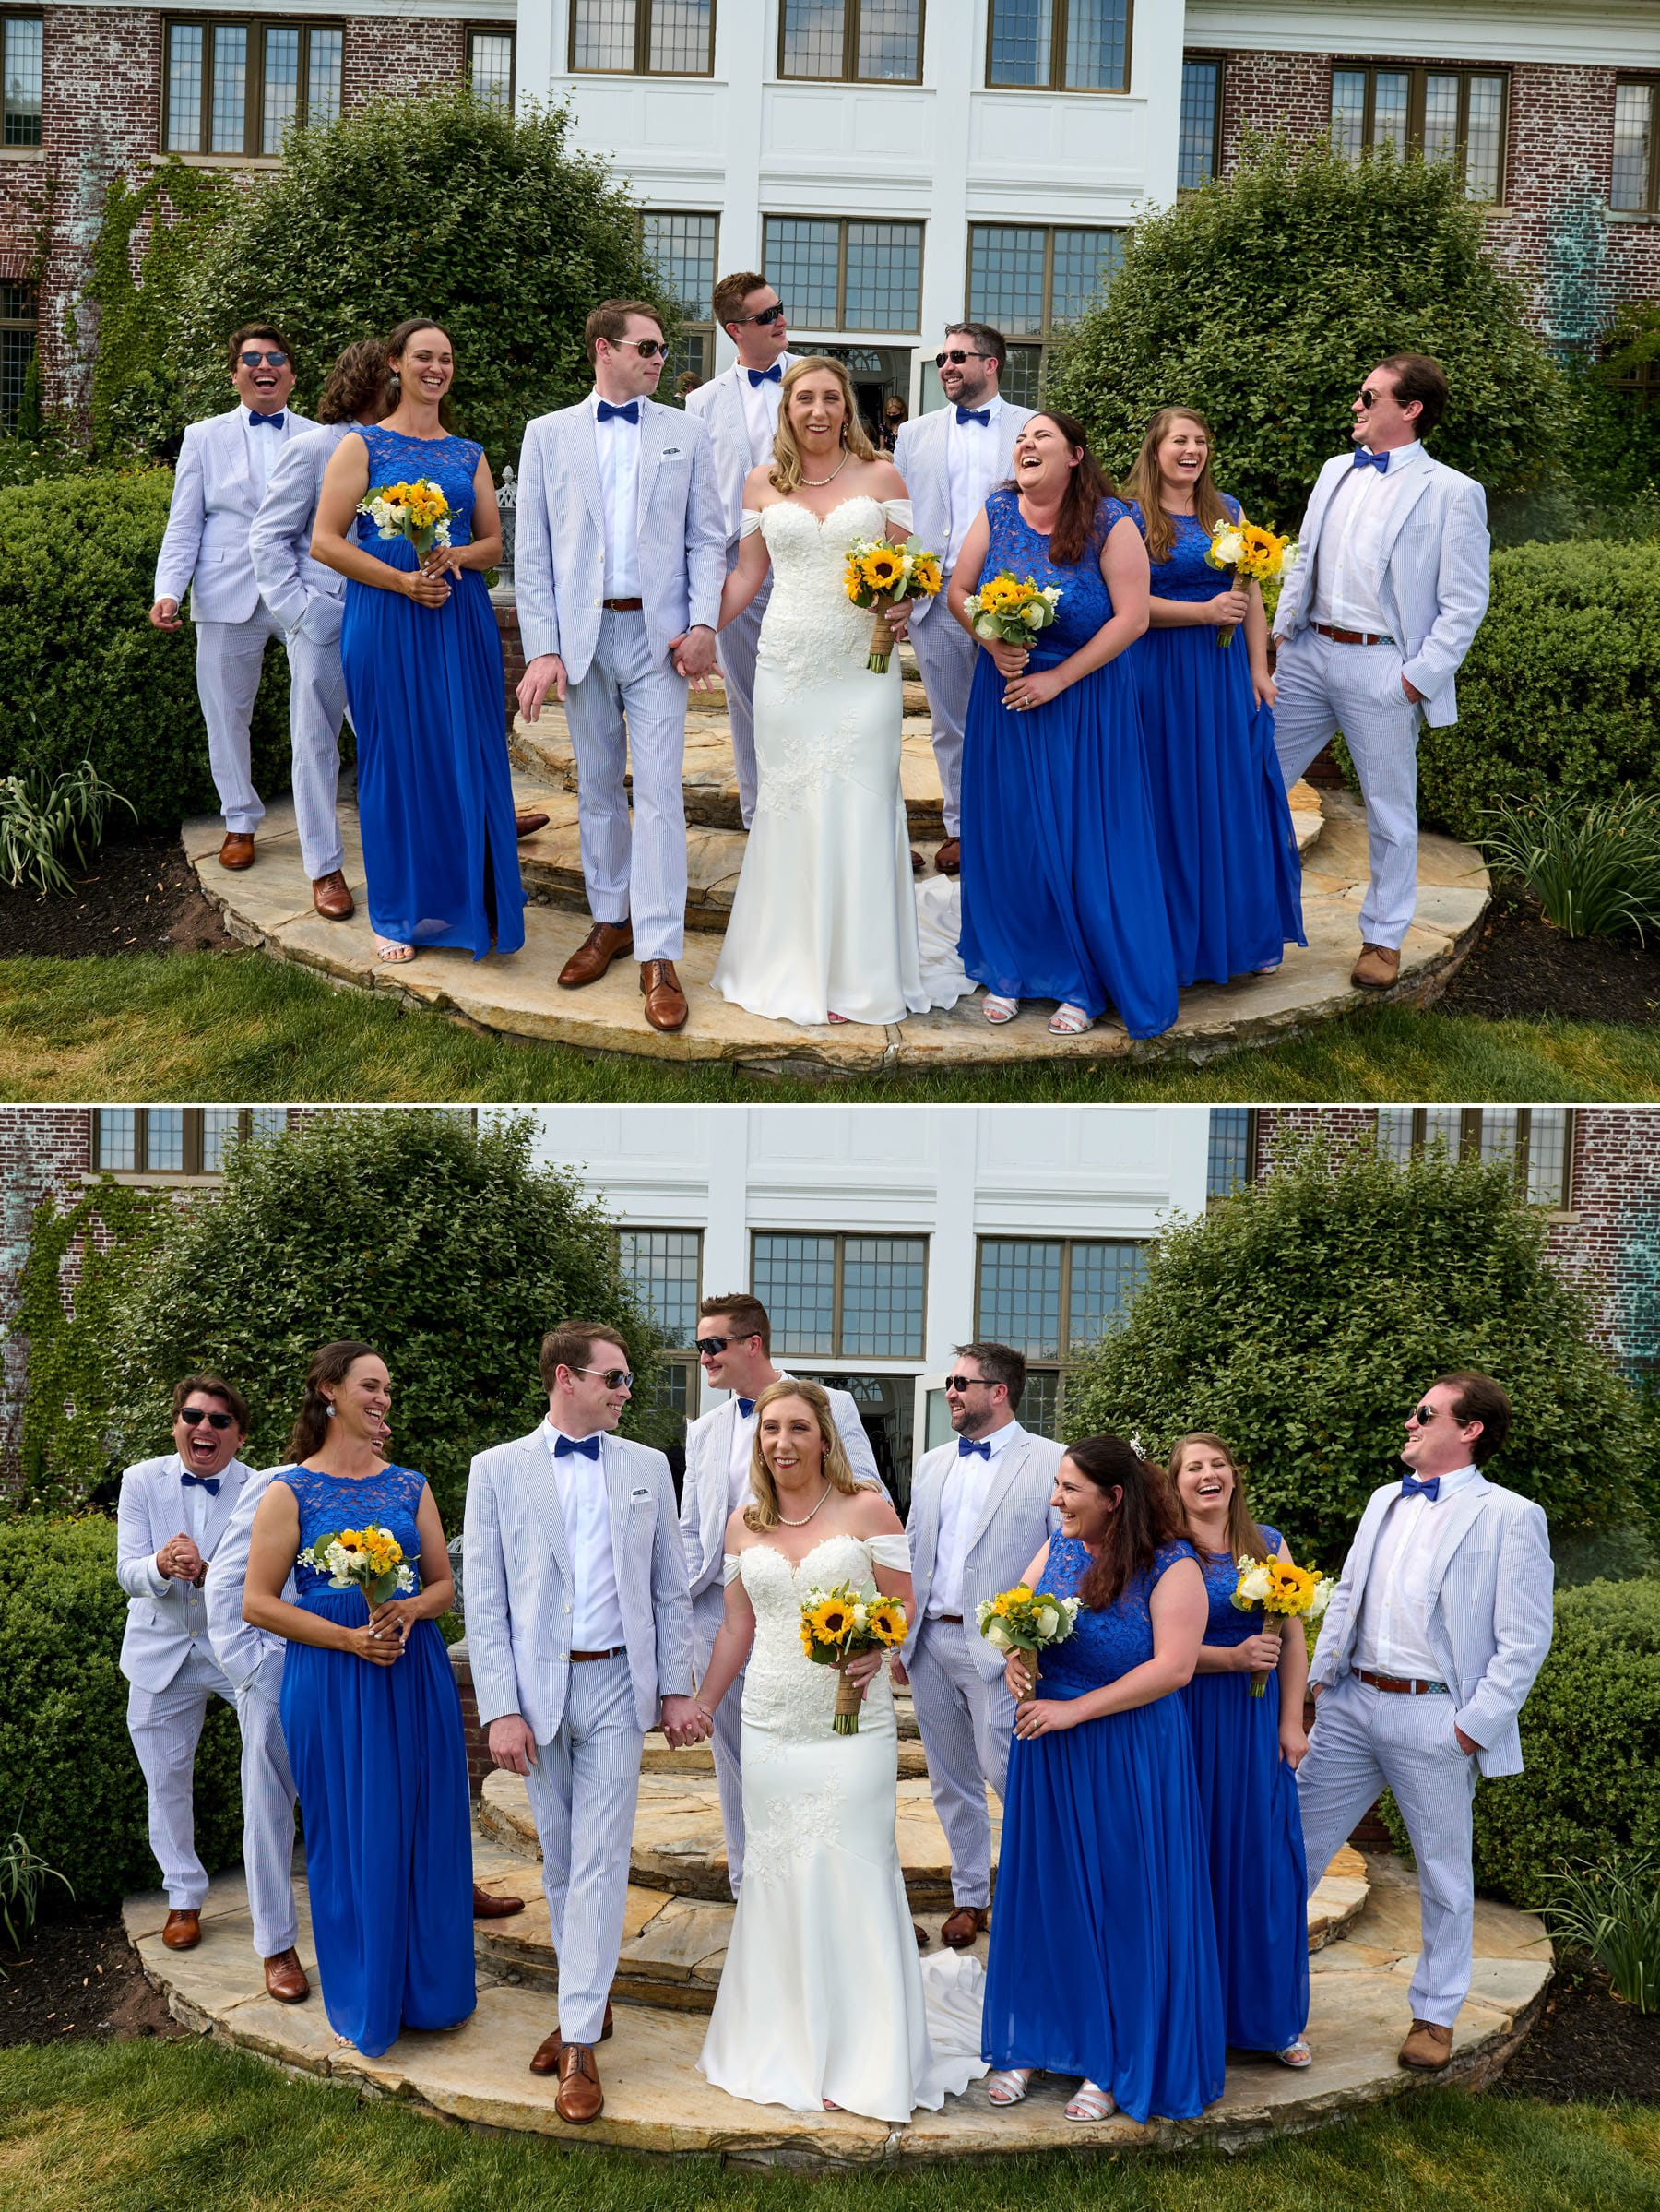 bridal party photos at Hamilton Farm Golf Club